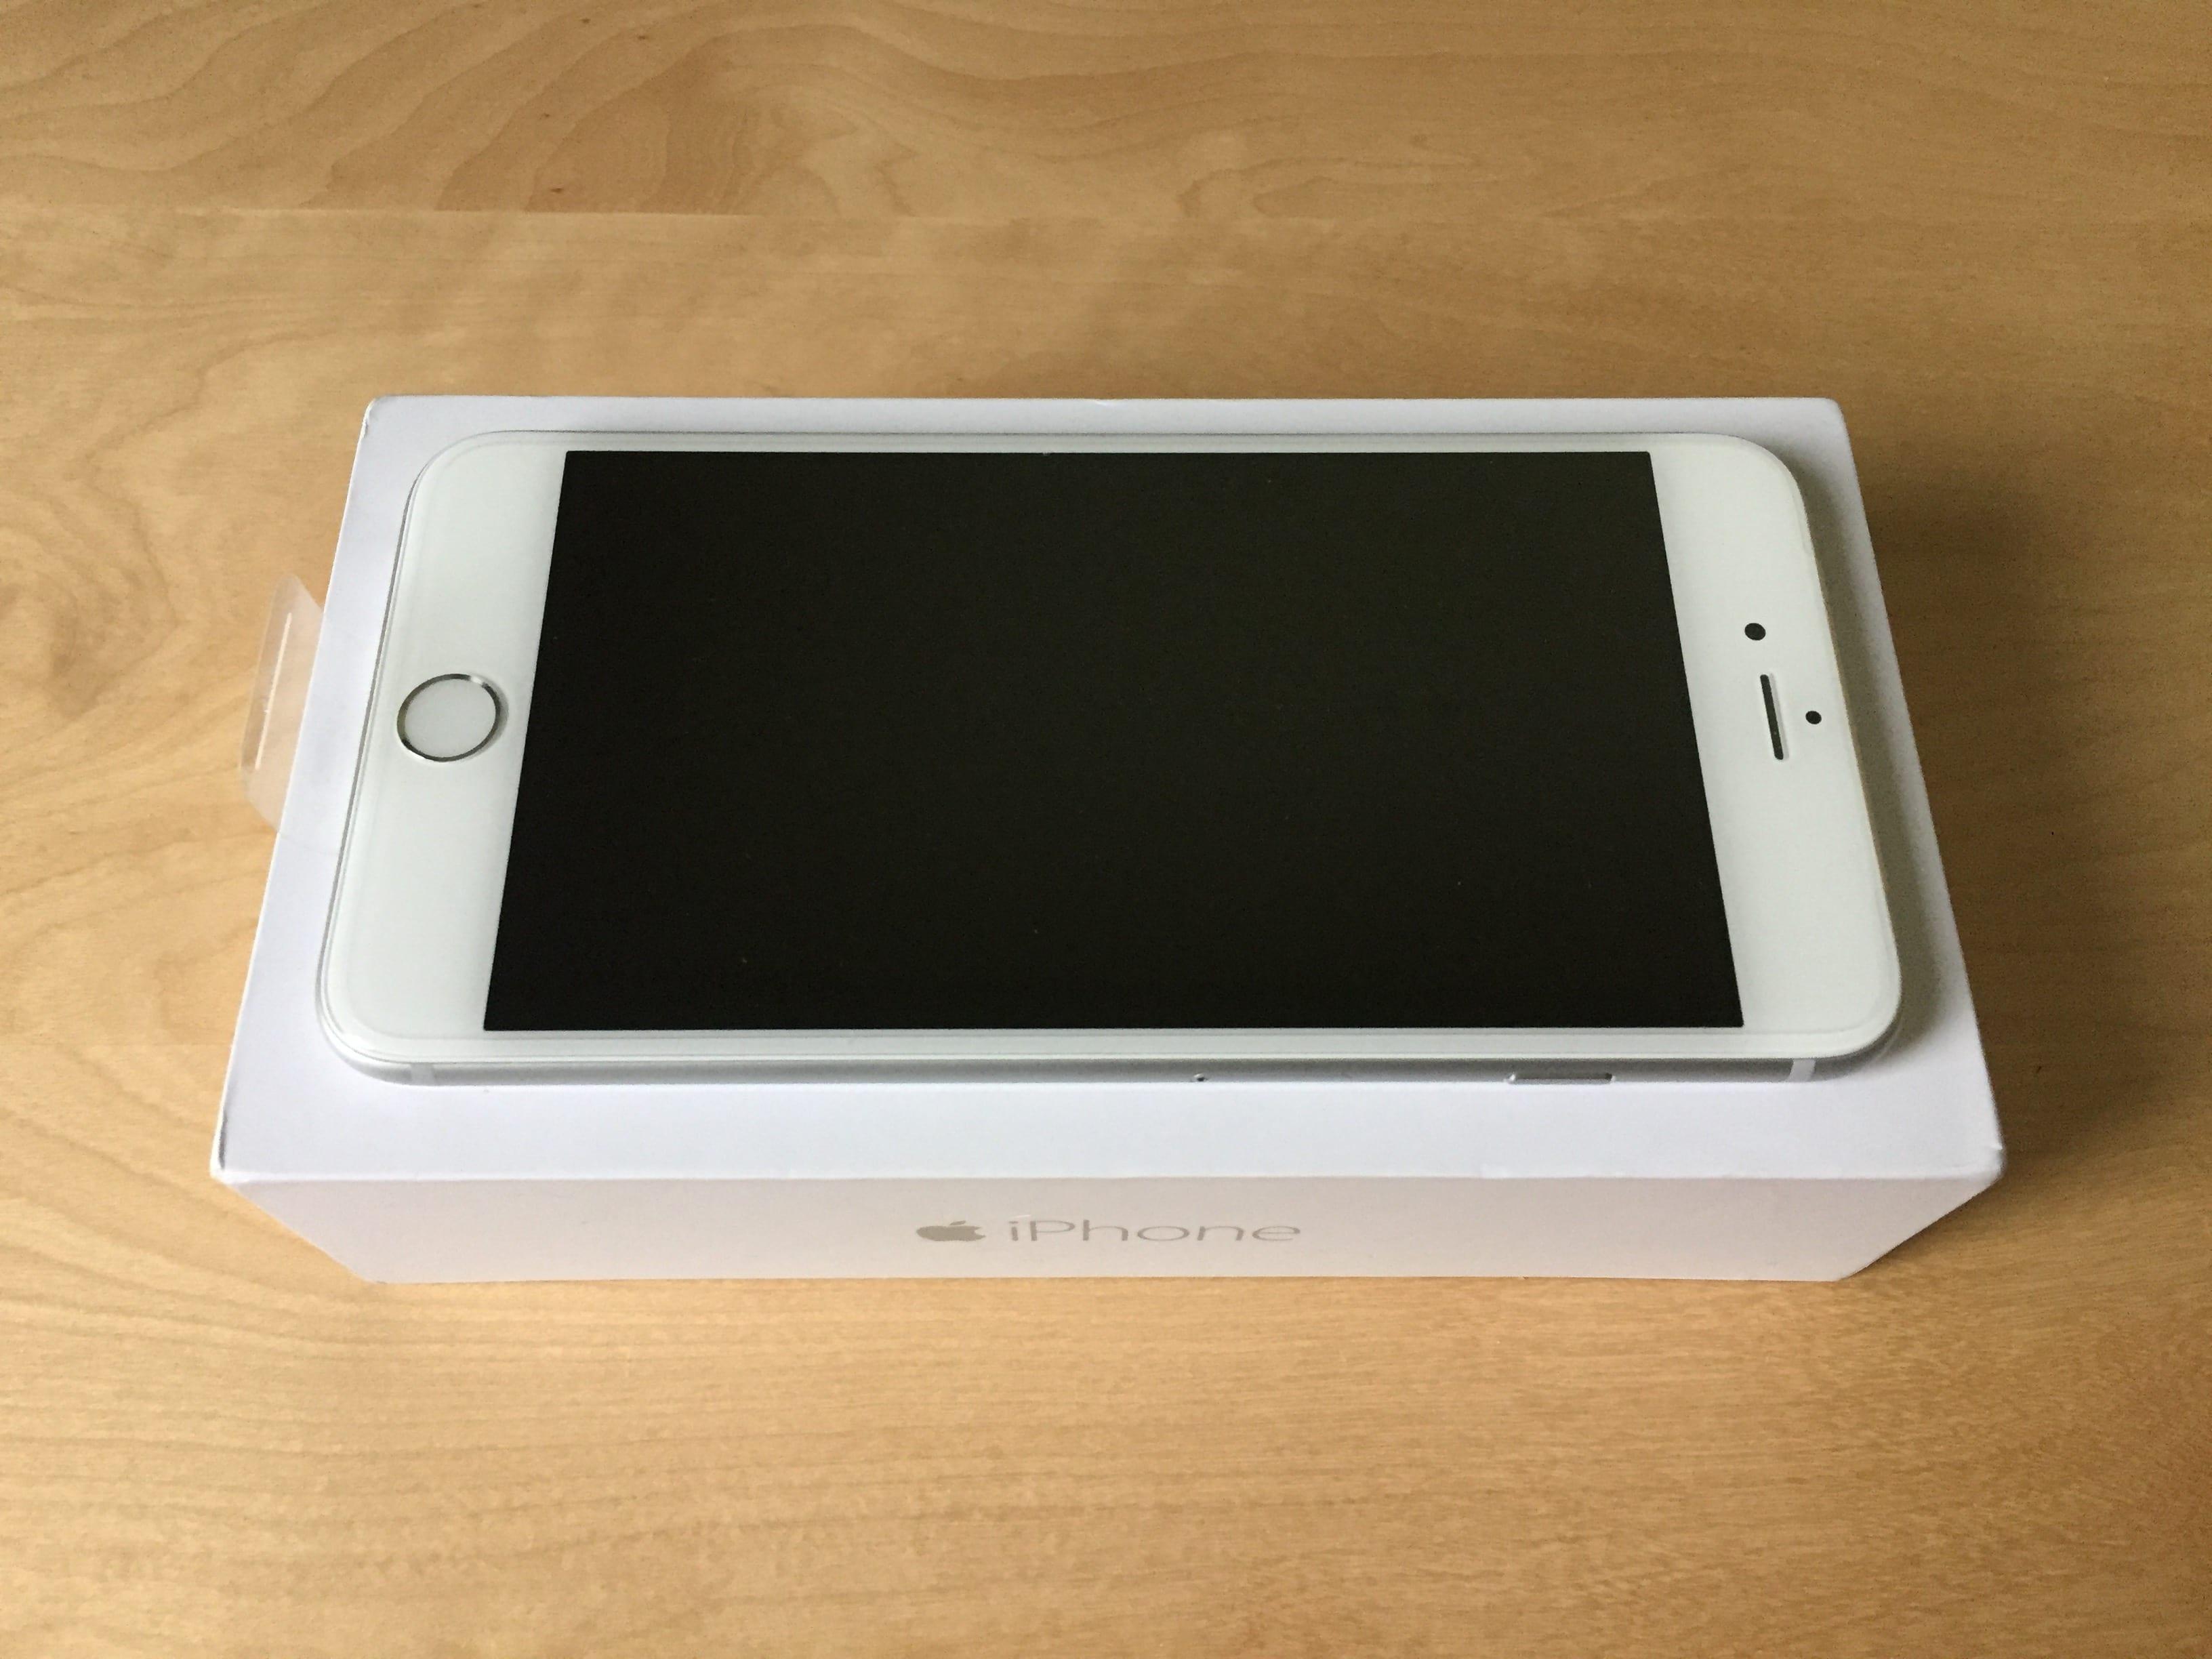 Zobraziť inzerát ~ MacBlog.sk - iPhone - Predám Apple iPhone 6 Plus ... 0d555b01ae0